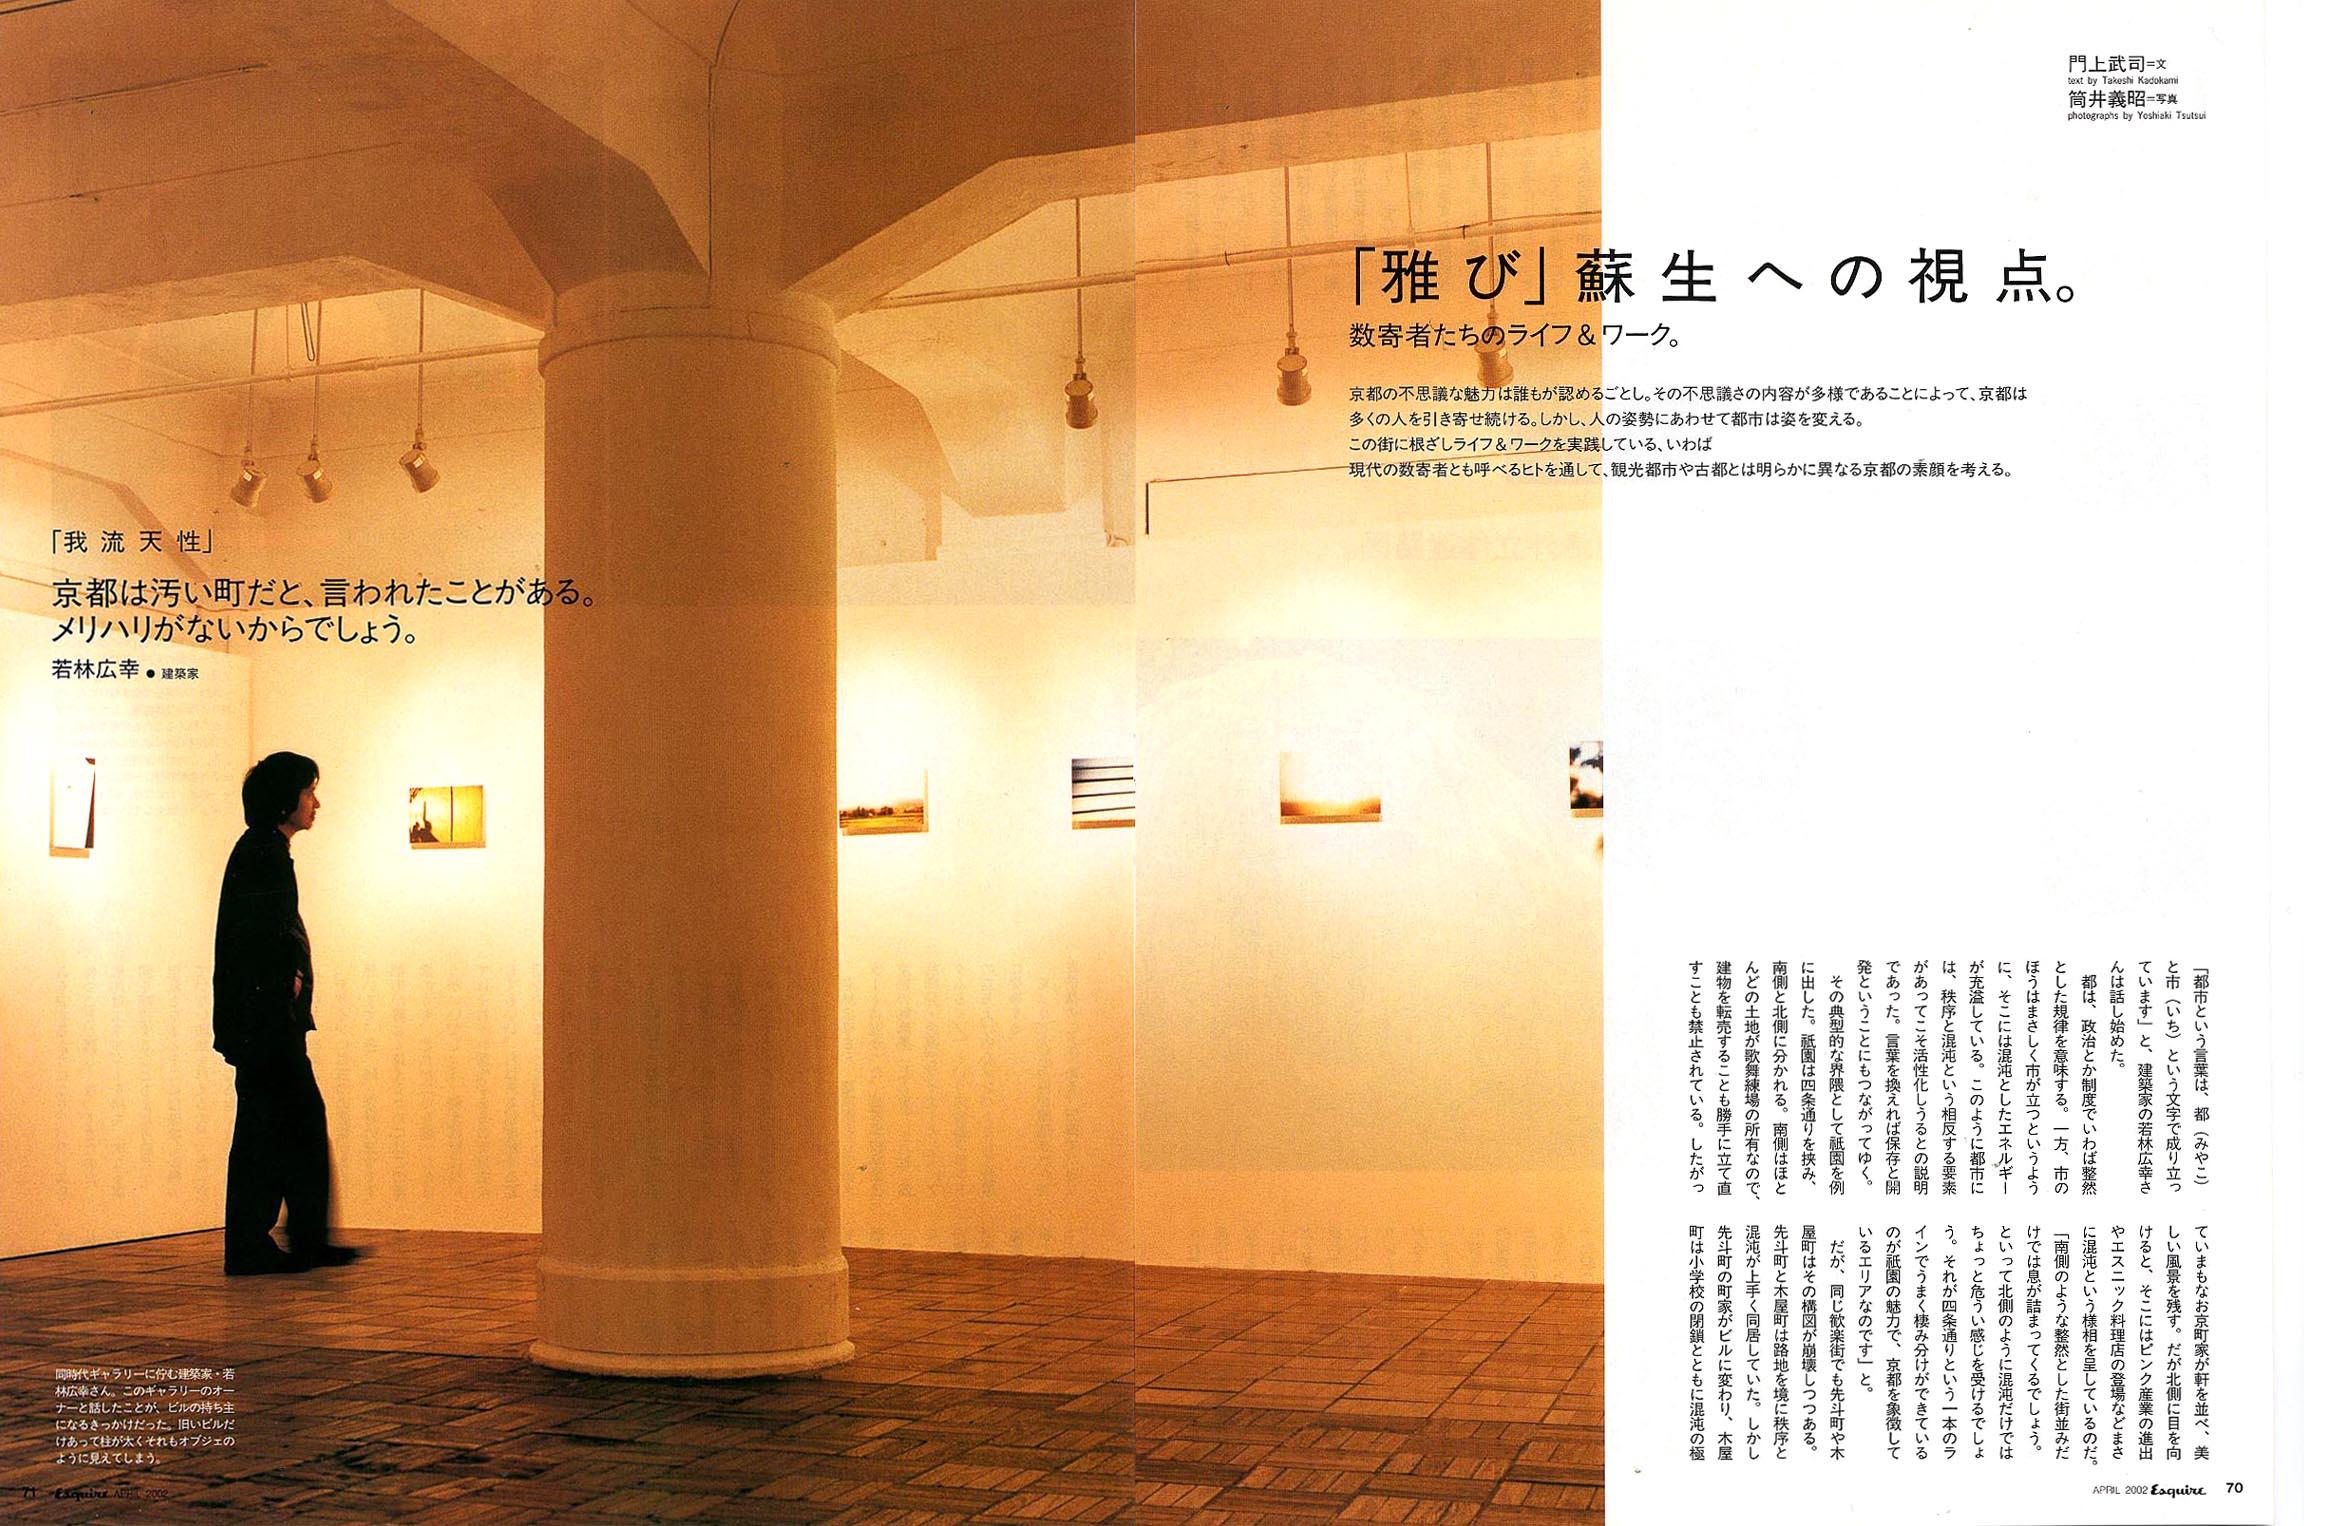 20070105-otonanokyoto_01.jpg